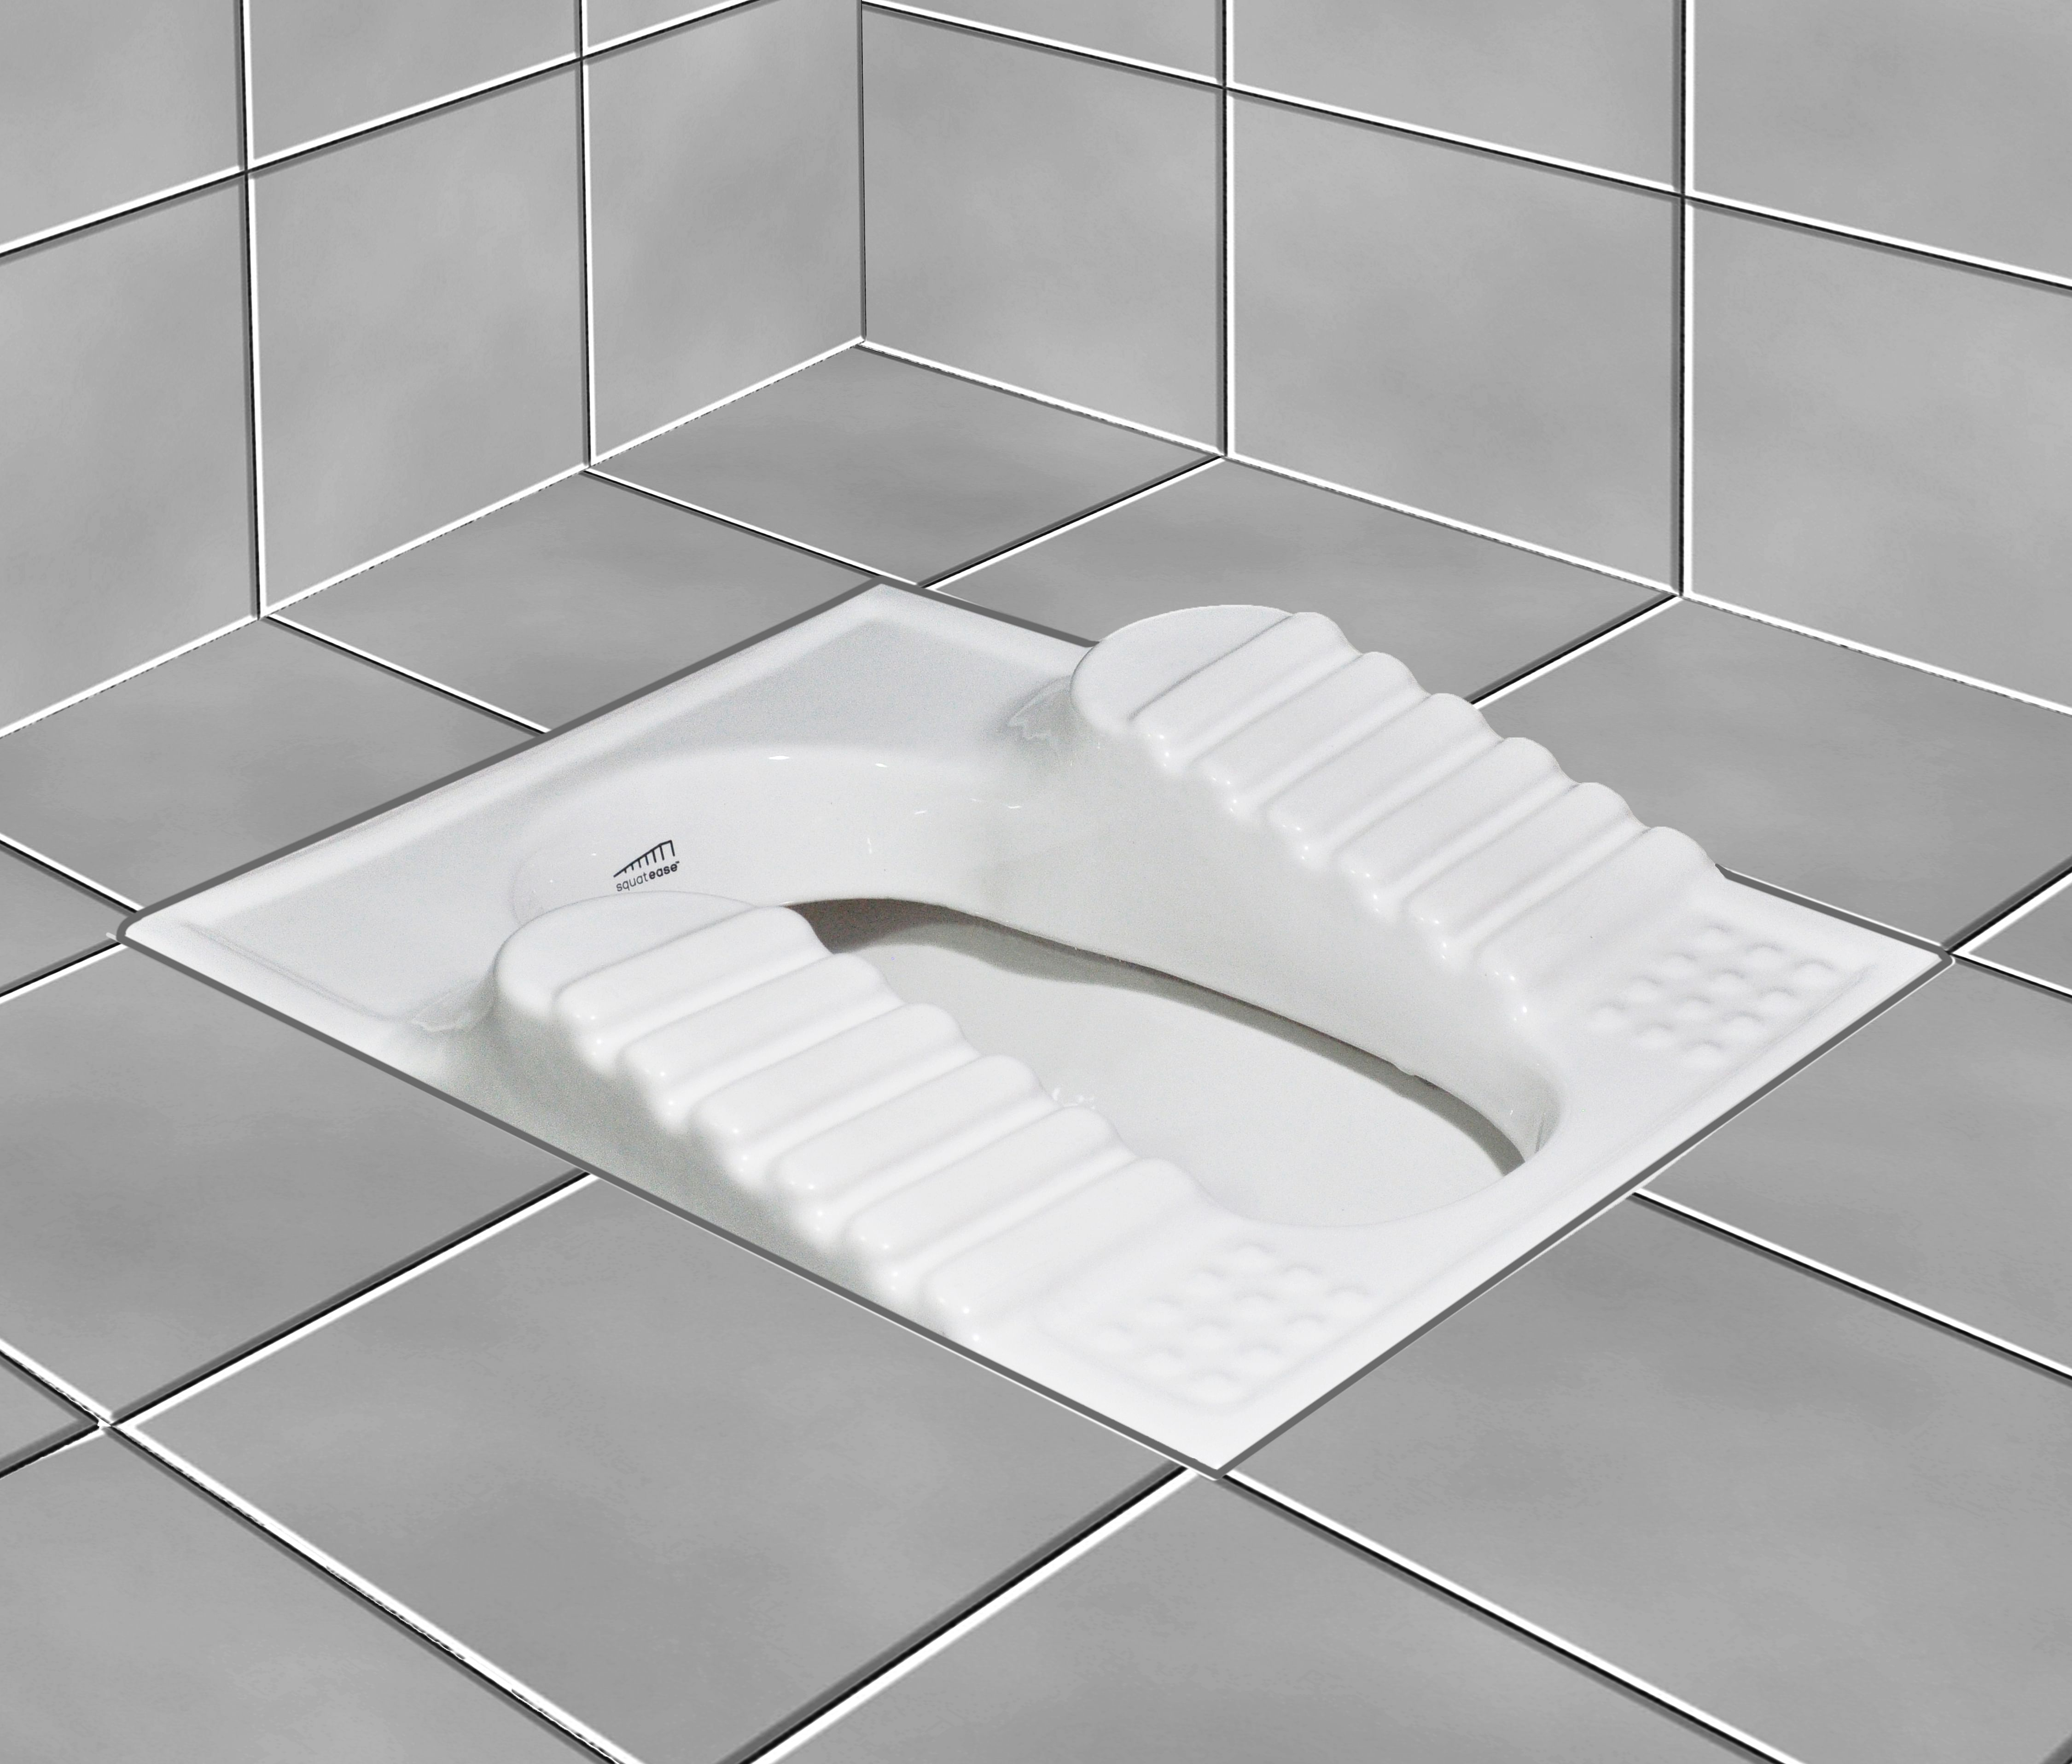 Peachy Innovation Makes Using The Indian Toilet Easy Pain Free Frankydiablos Diy Chair Ideas Frankydiabloscom